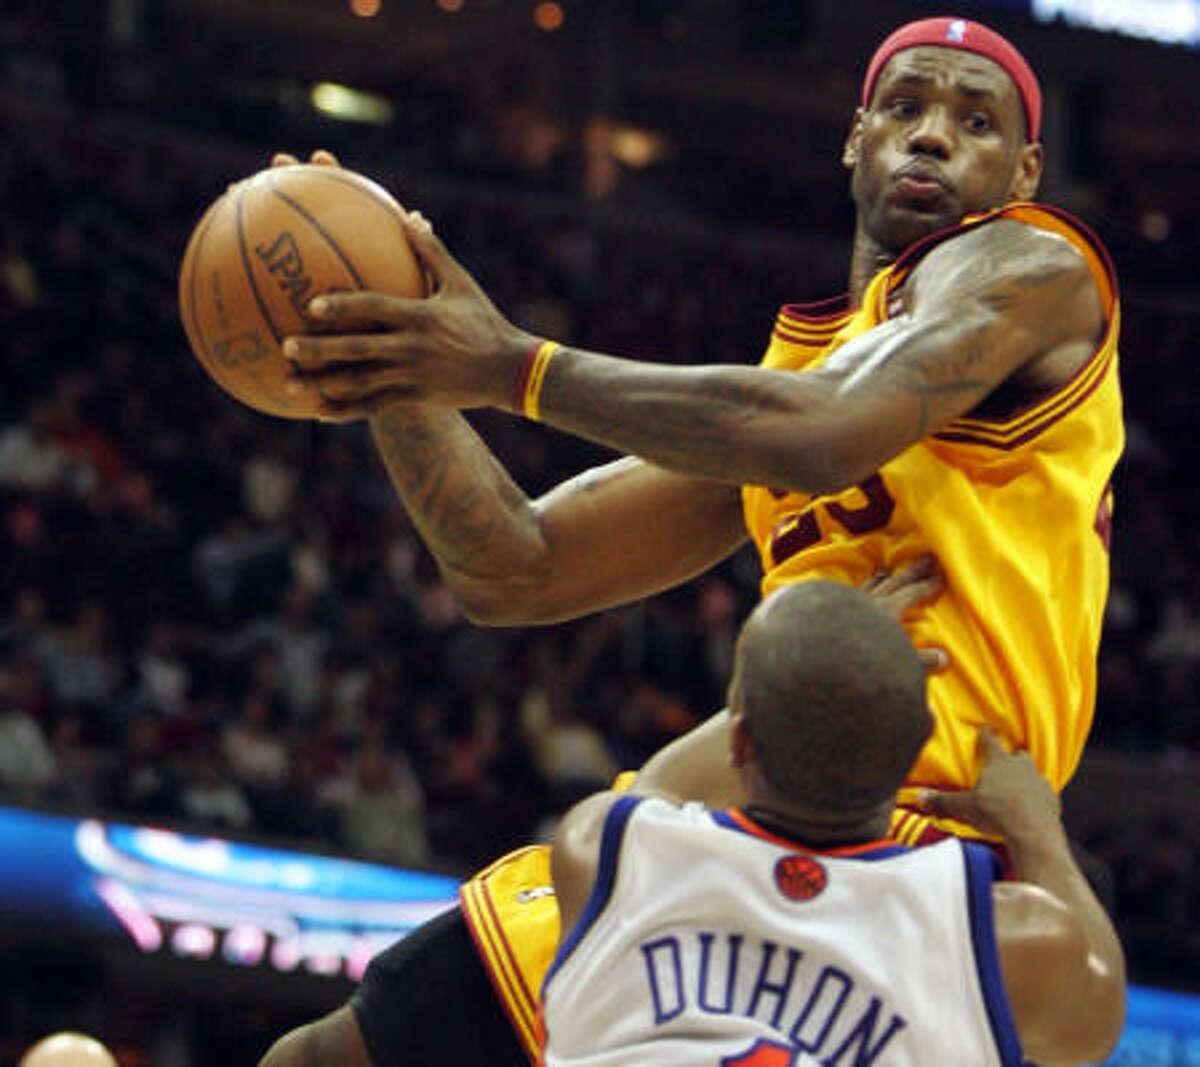 LeBron James , Cleveland Cavaliers, 27.7 ppg